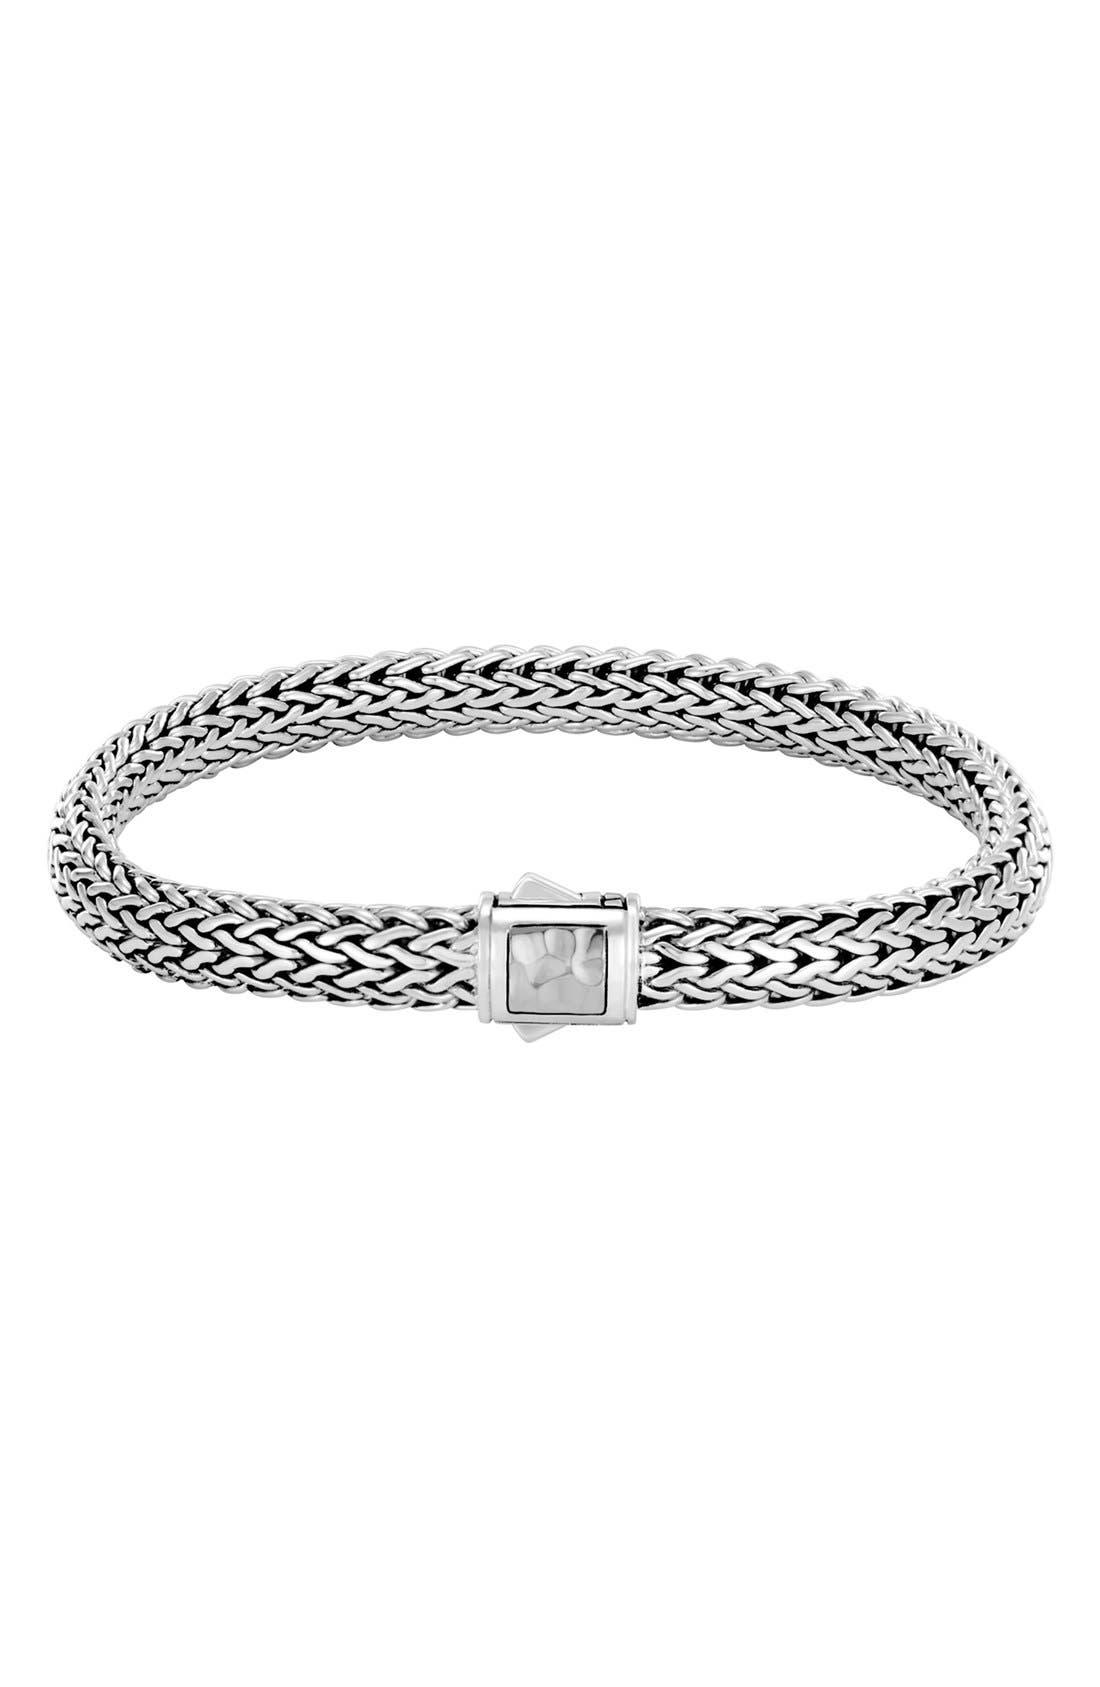 6.5mm Hammered Clasp Bracelet,                         Main,                         color, Silver